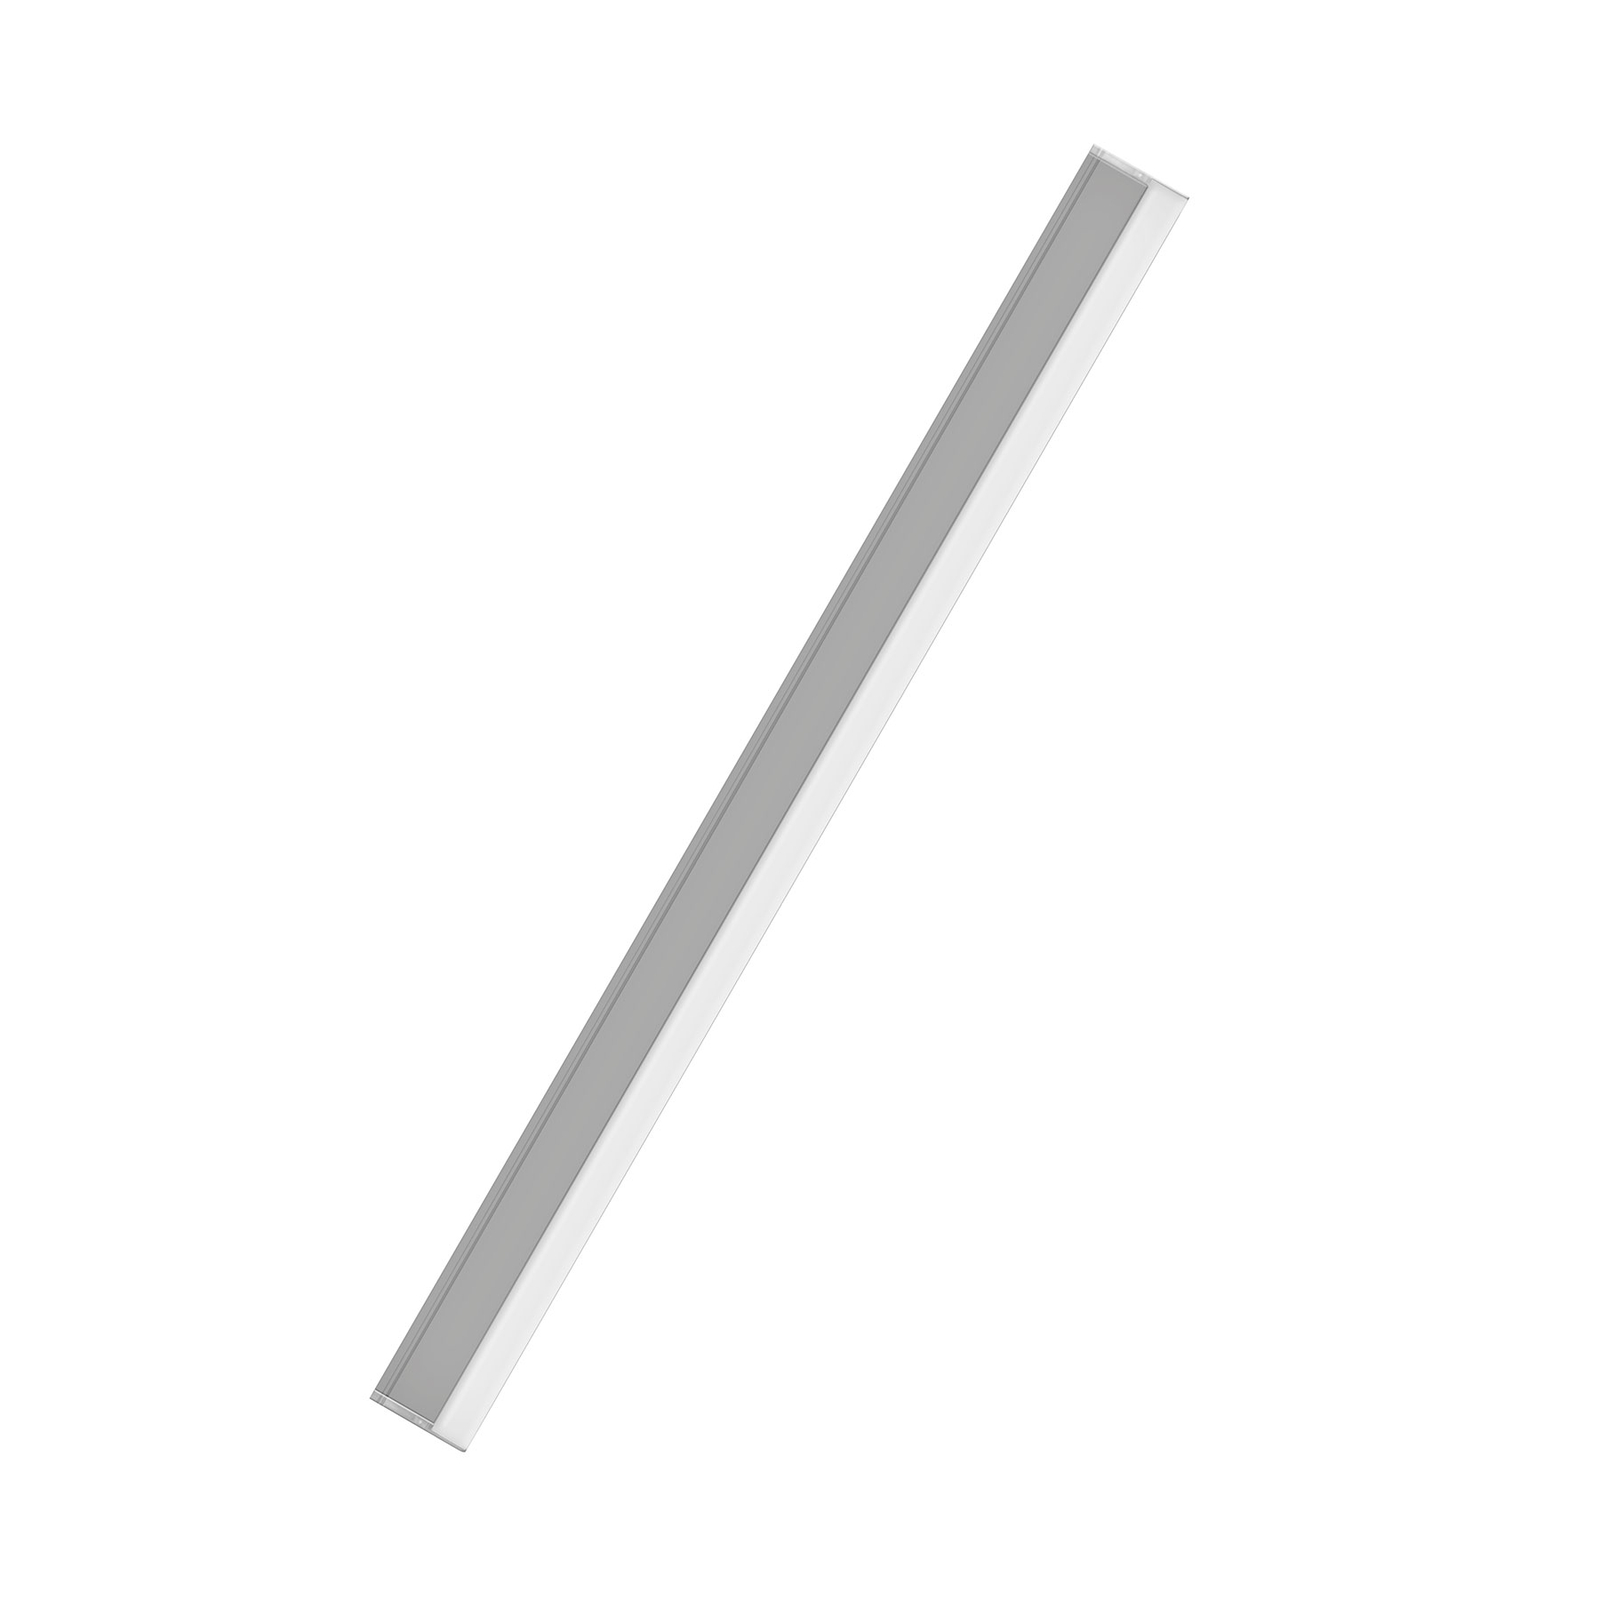 Siteco Combilite LED-F Lichtleiste Länge 58cm 830